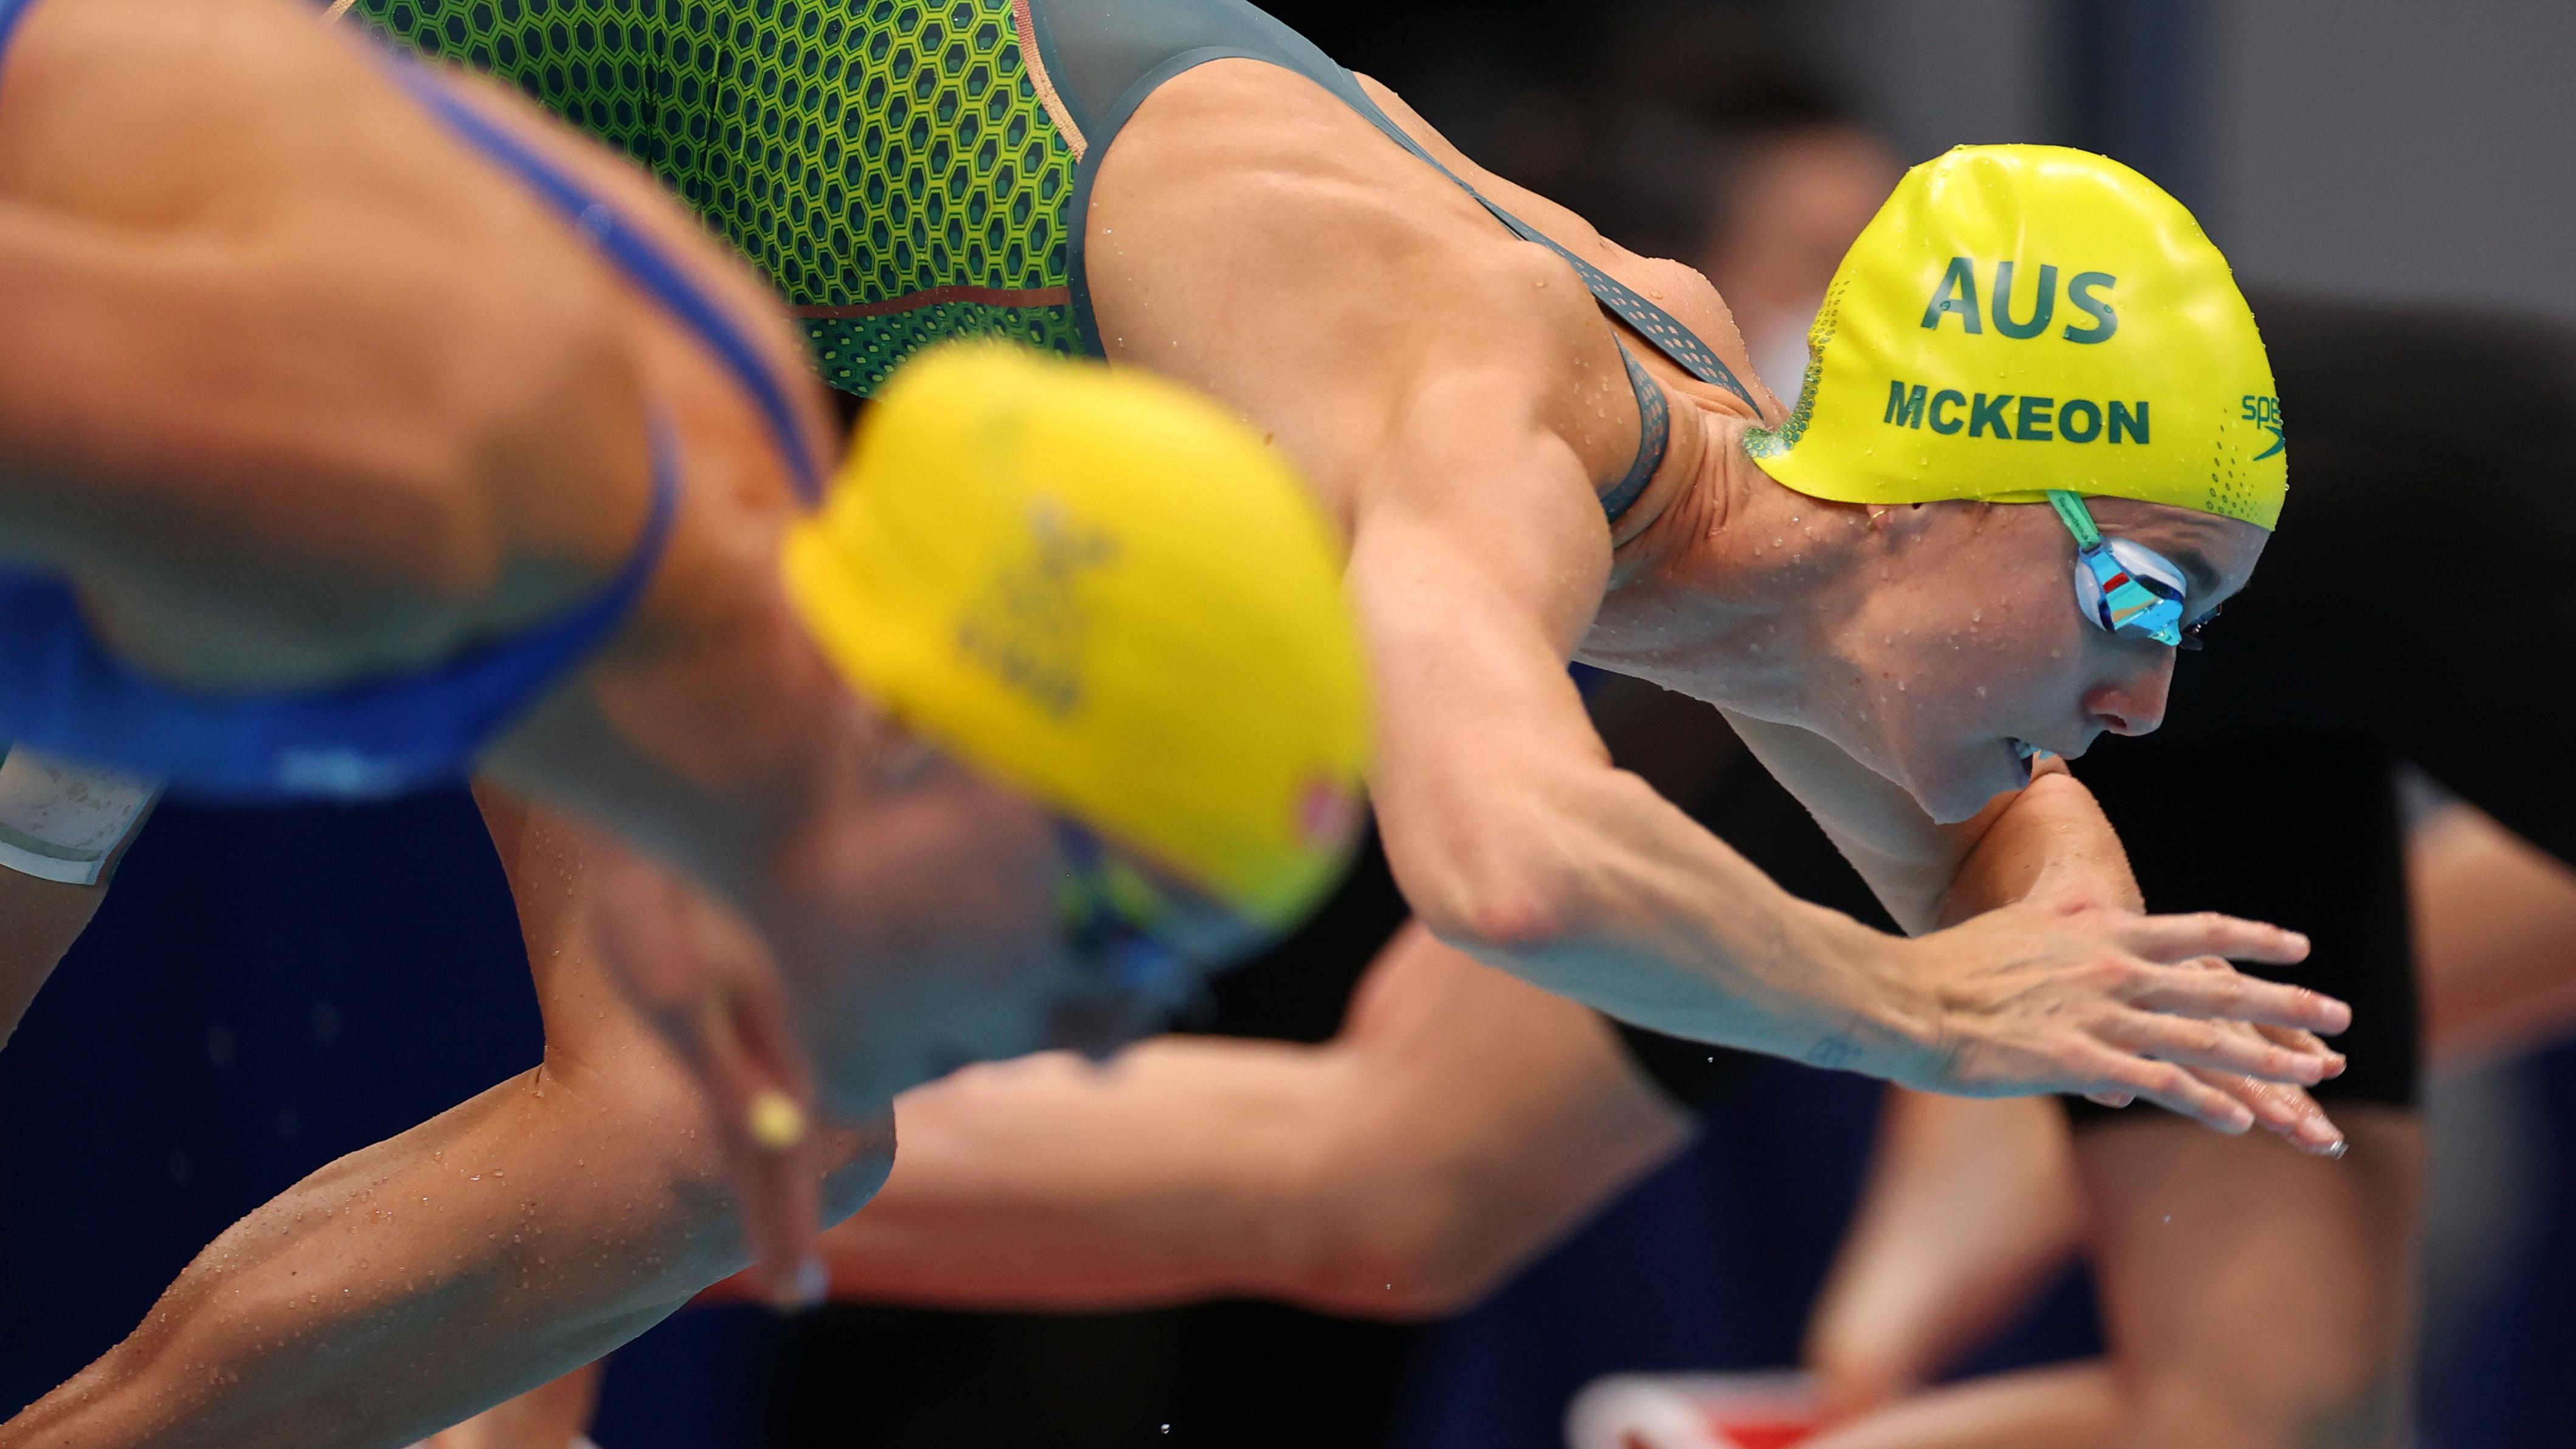 Tokyo 2020 Olympics - Swimming - Women's 100m Freestyle - Semifinal 2 - Tokyo Aquatics Centre - Tokyo, Japan - July 29, 2021. Emma McKeon of Australia in action. REUTERS/Marko Djurica